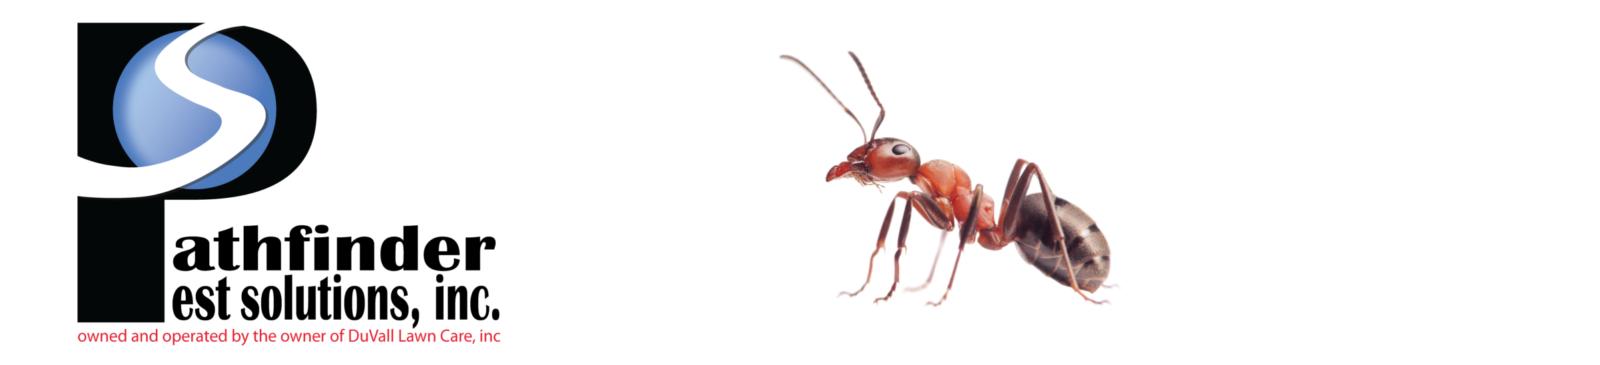 Pathfinder Pest Solutions, Inc.